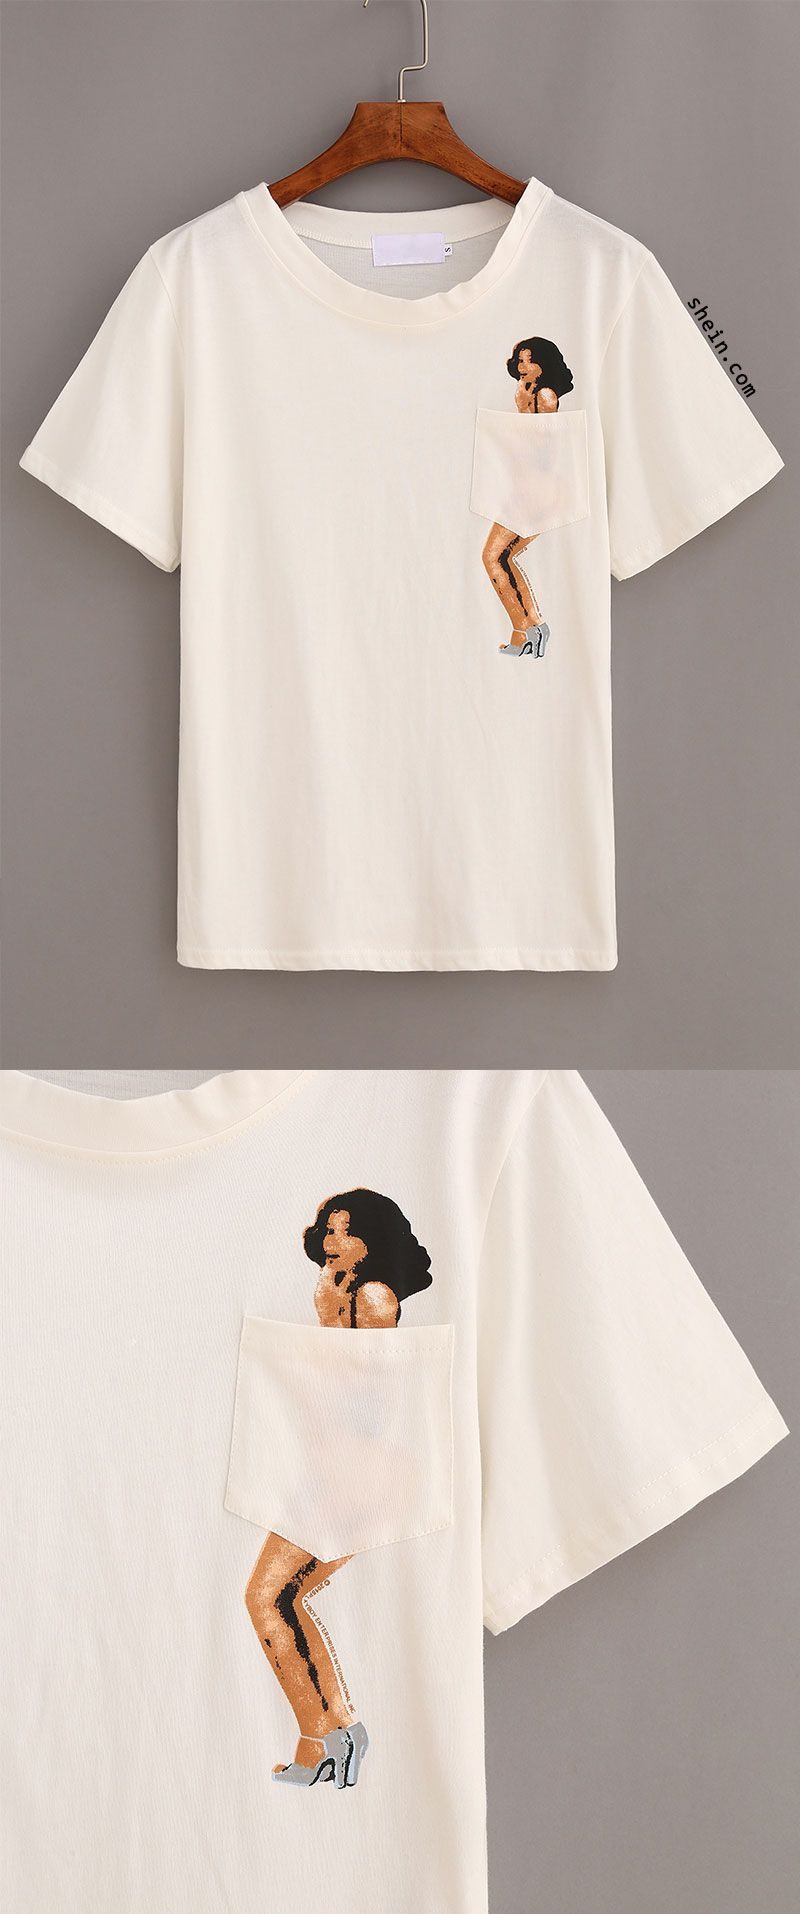 Young Lady Print Pocket T Shirt Diy Clothes Clothes Shirts